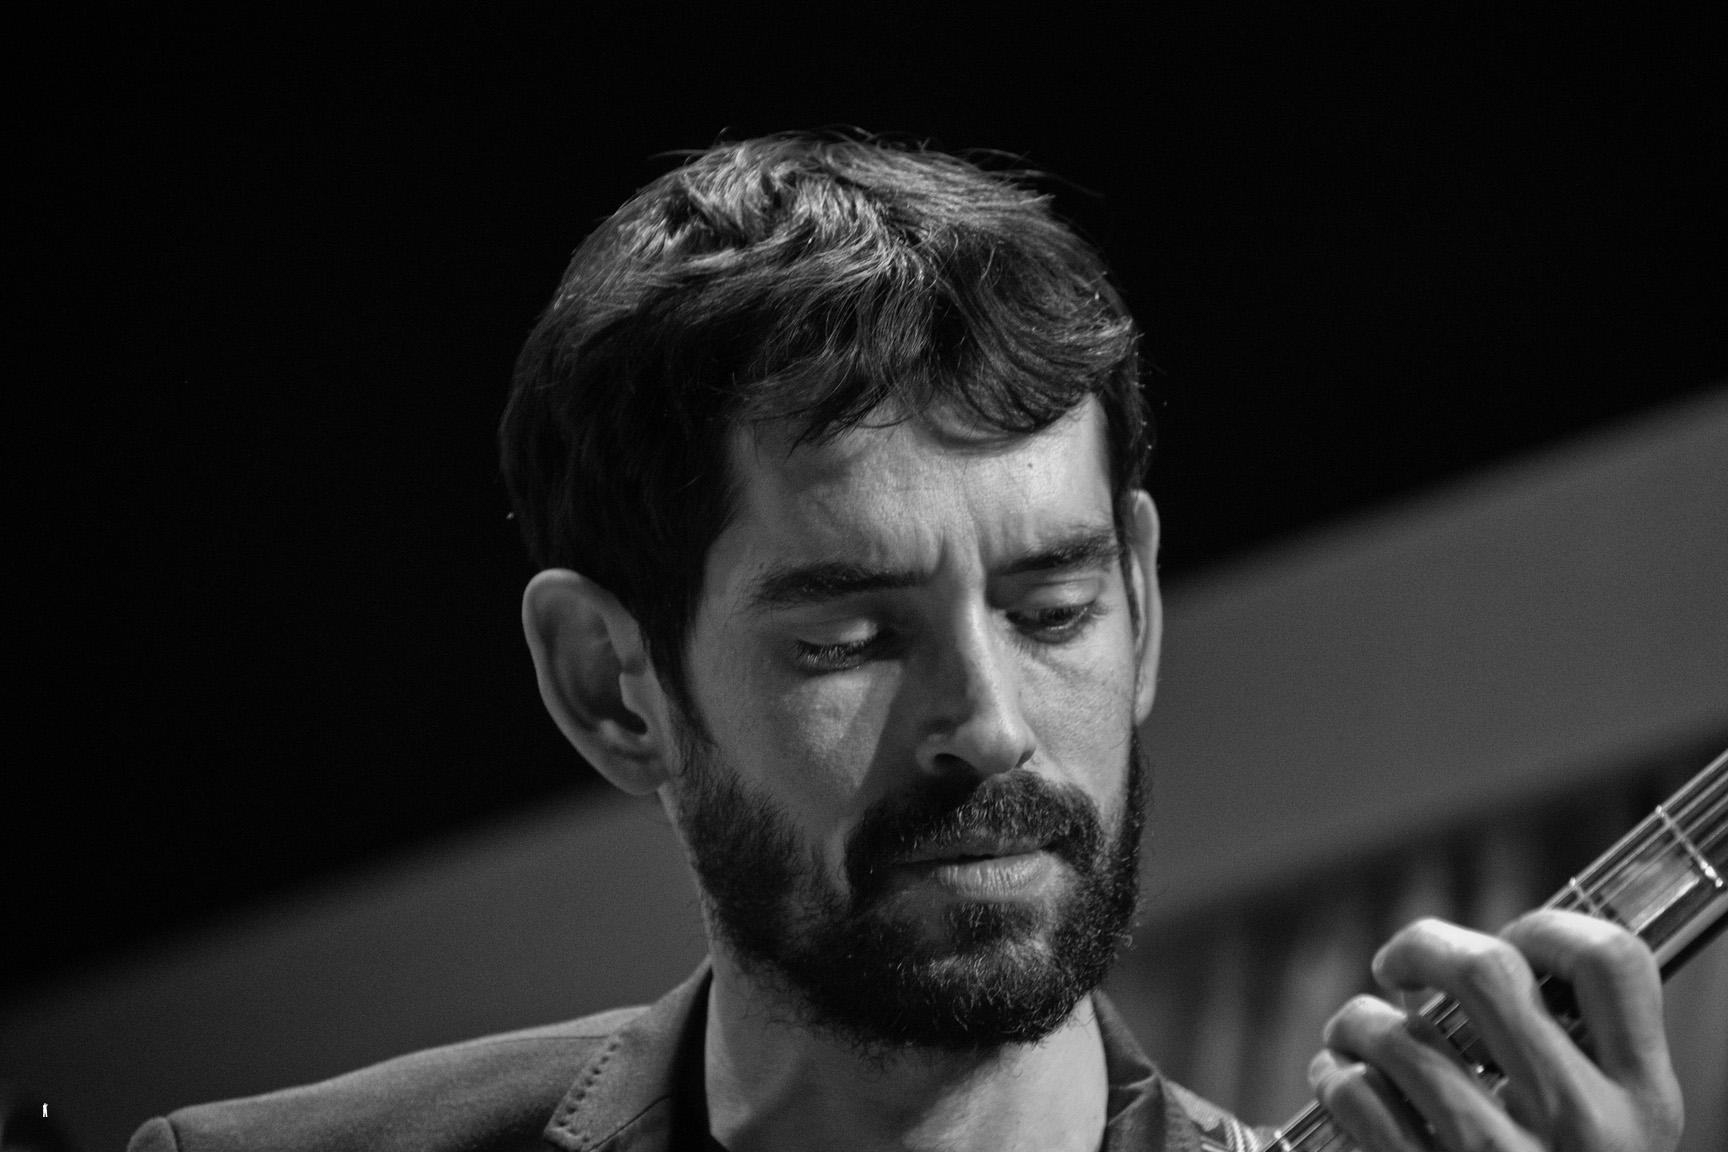 Jaume Llombart